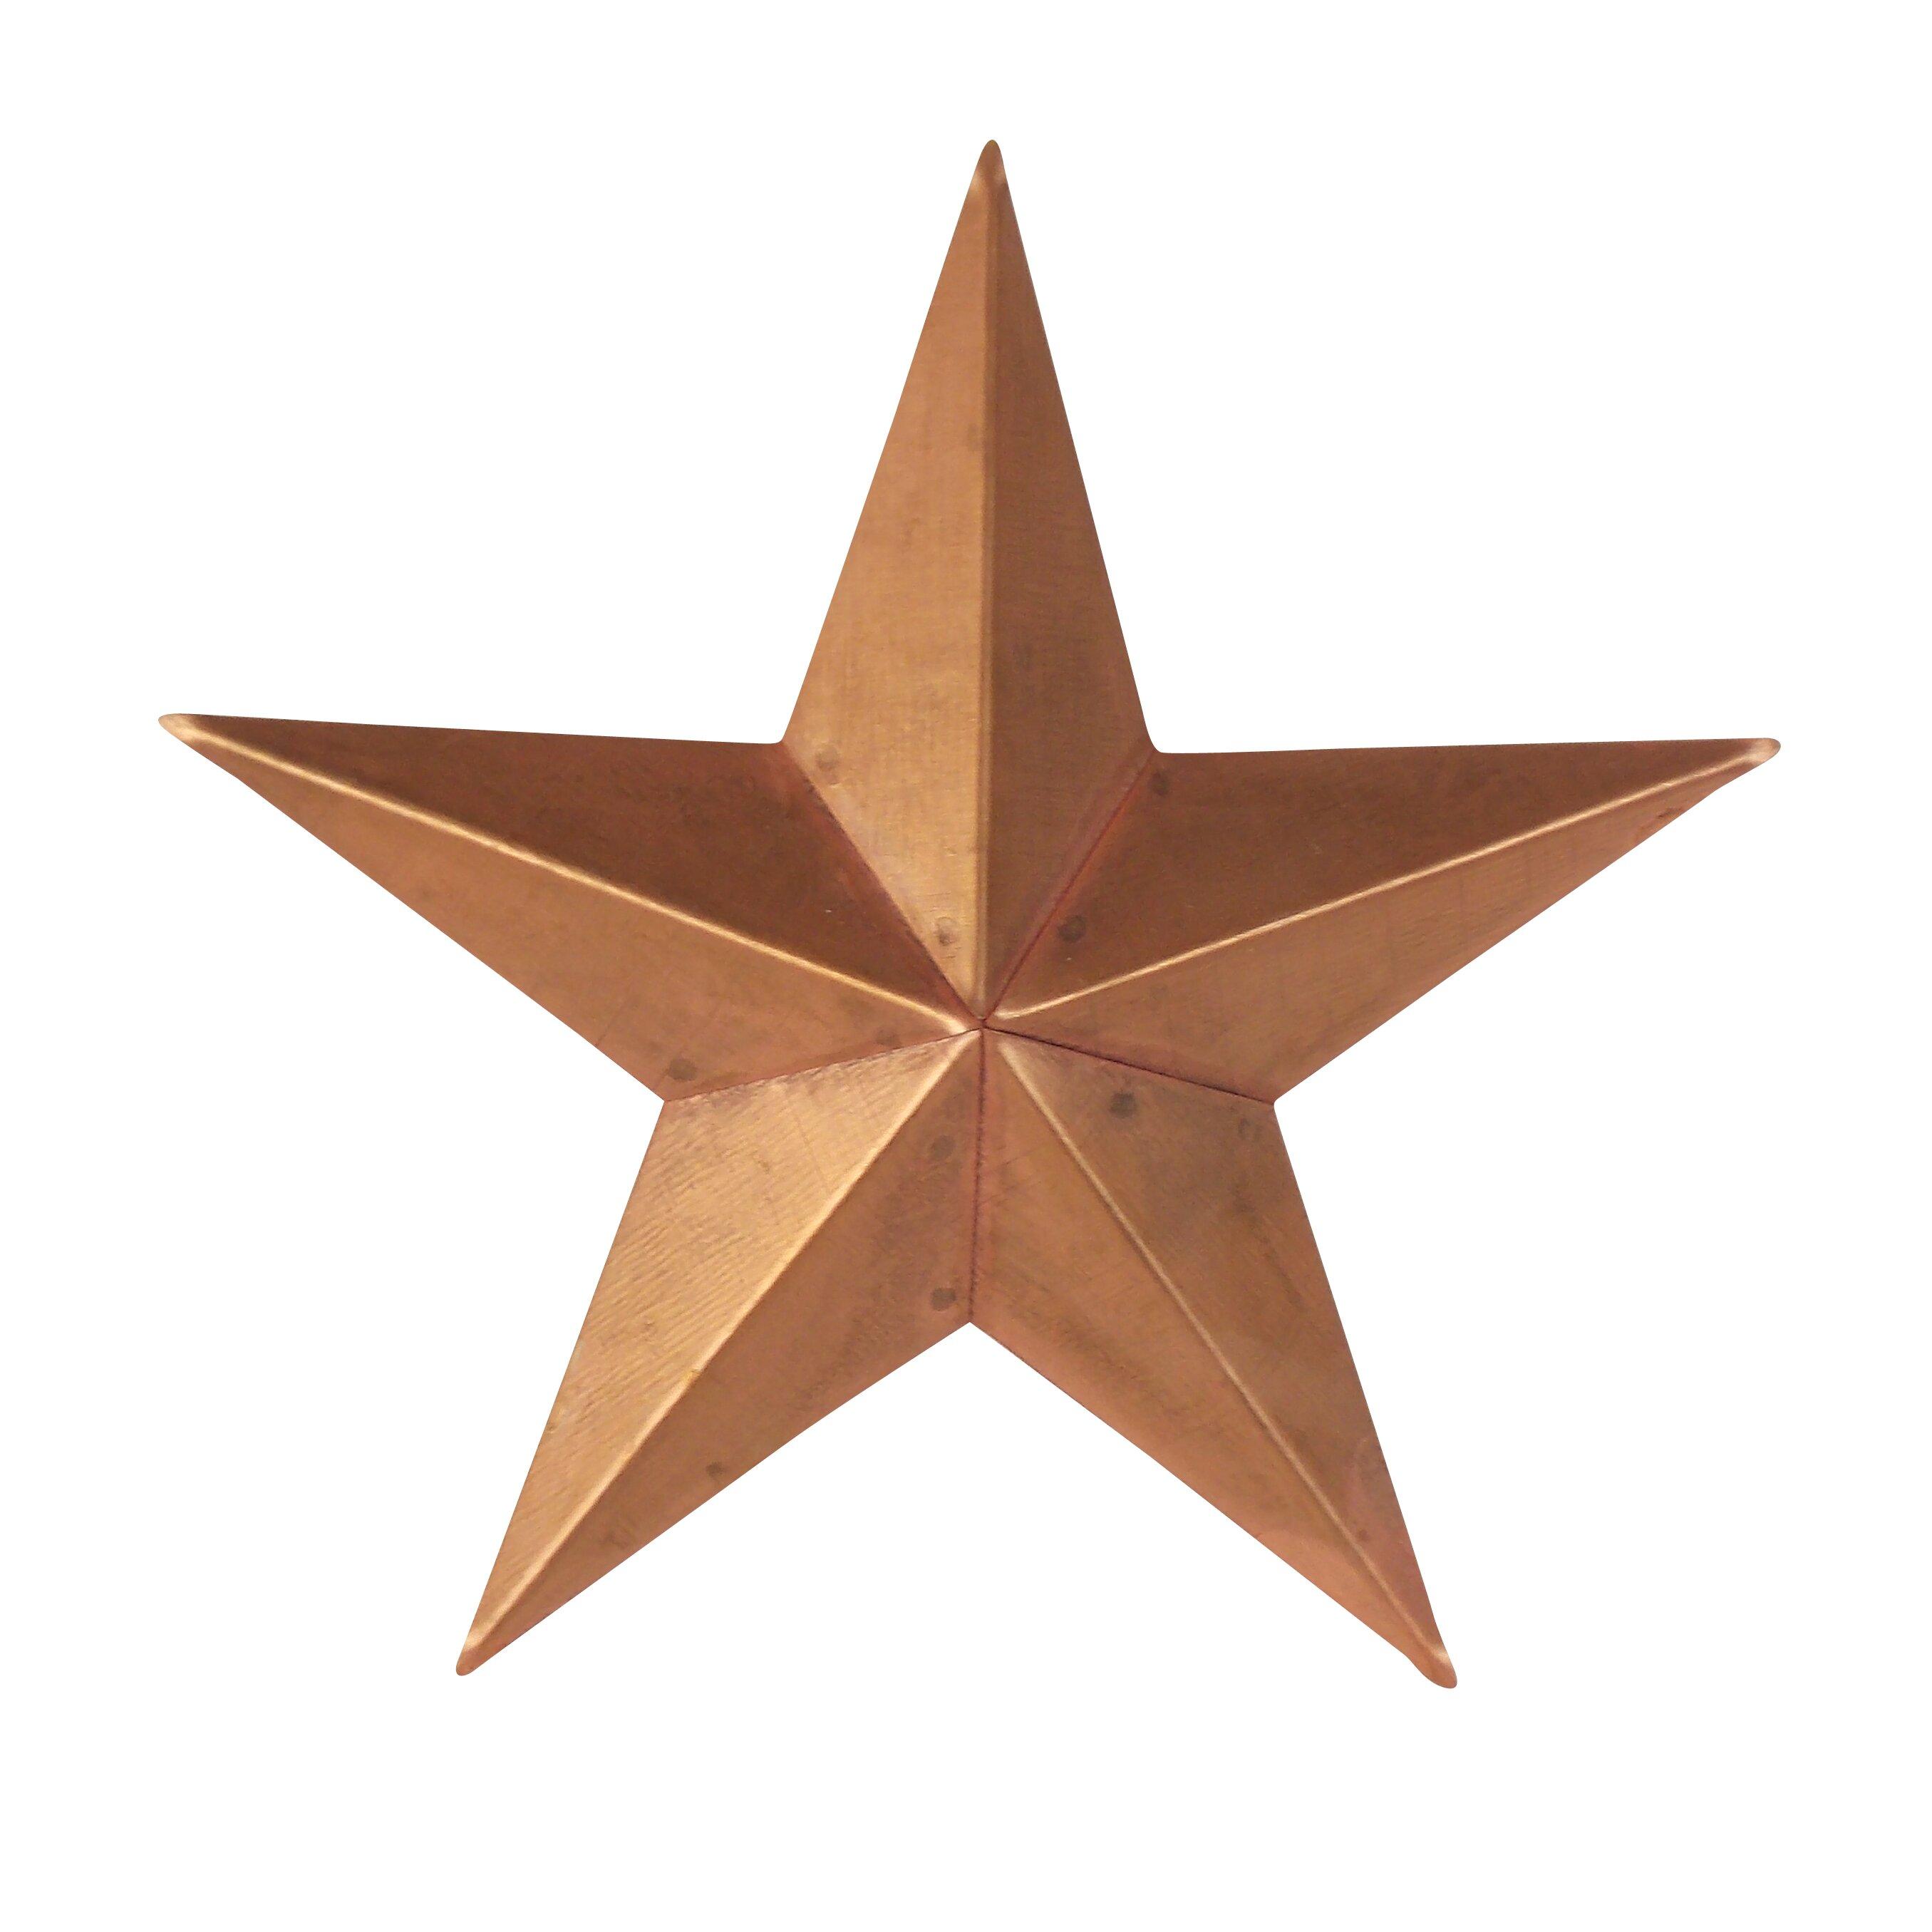 Tin Star Movie free download HD 720p